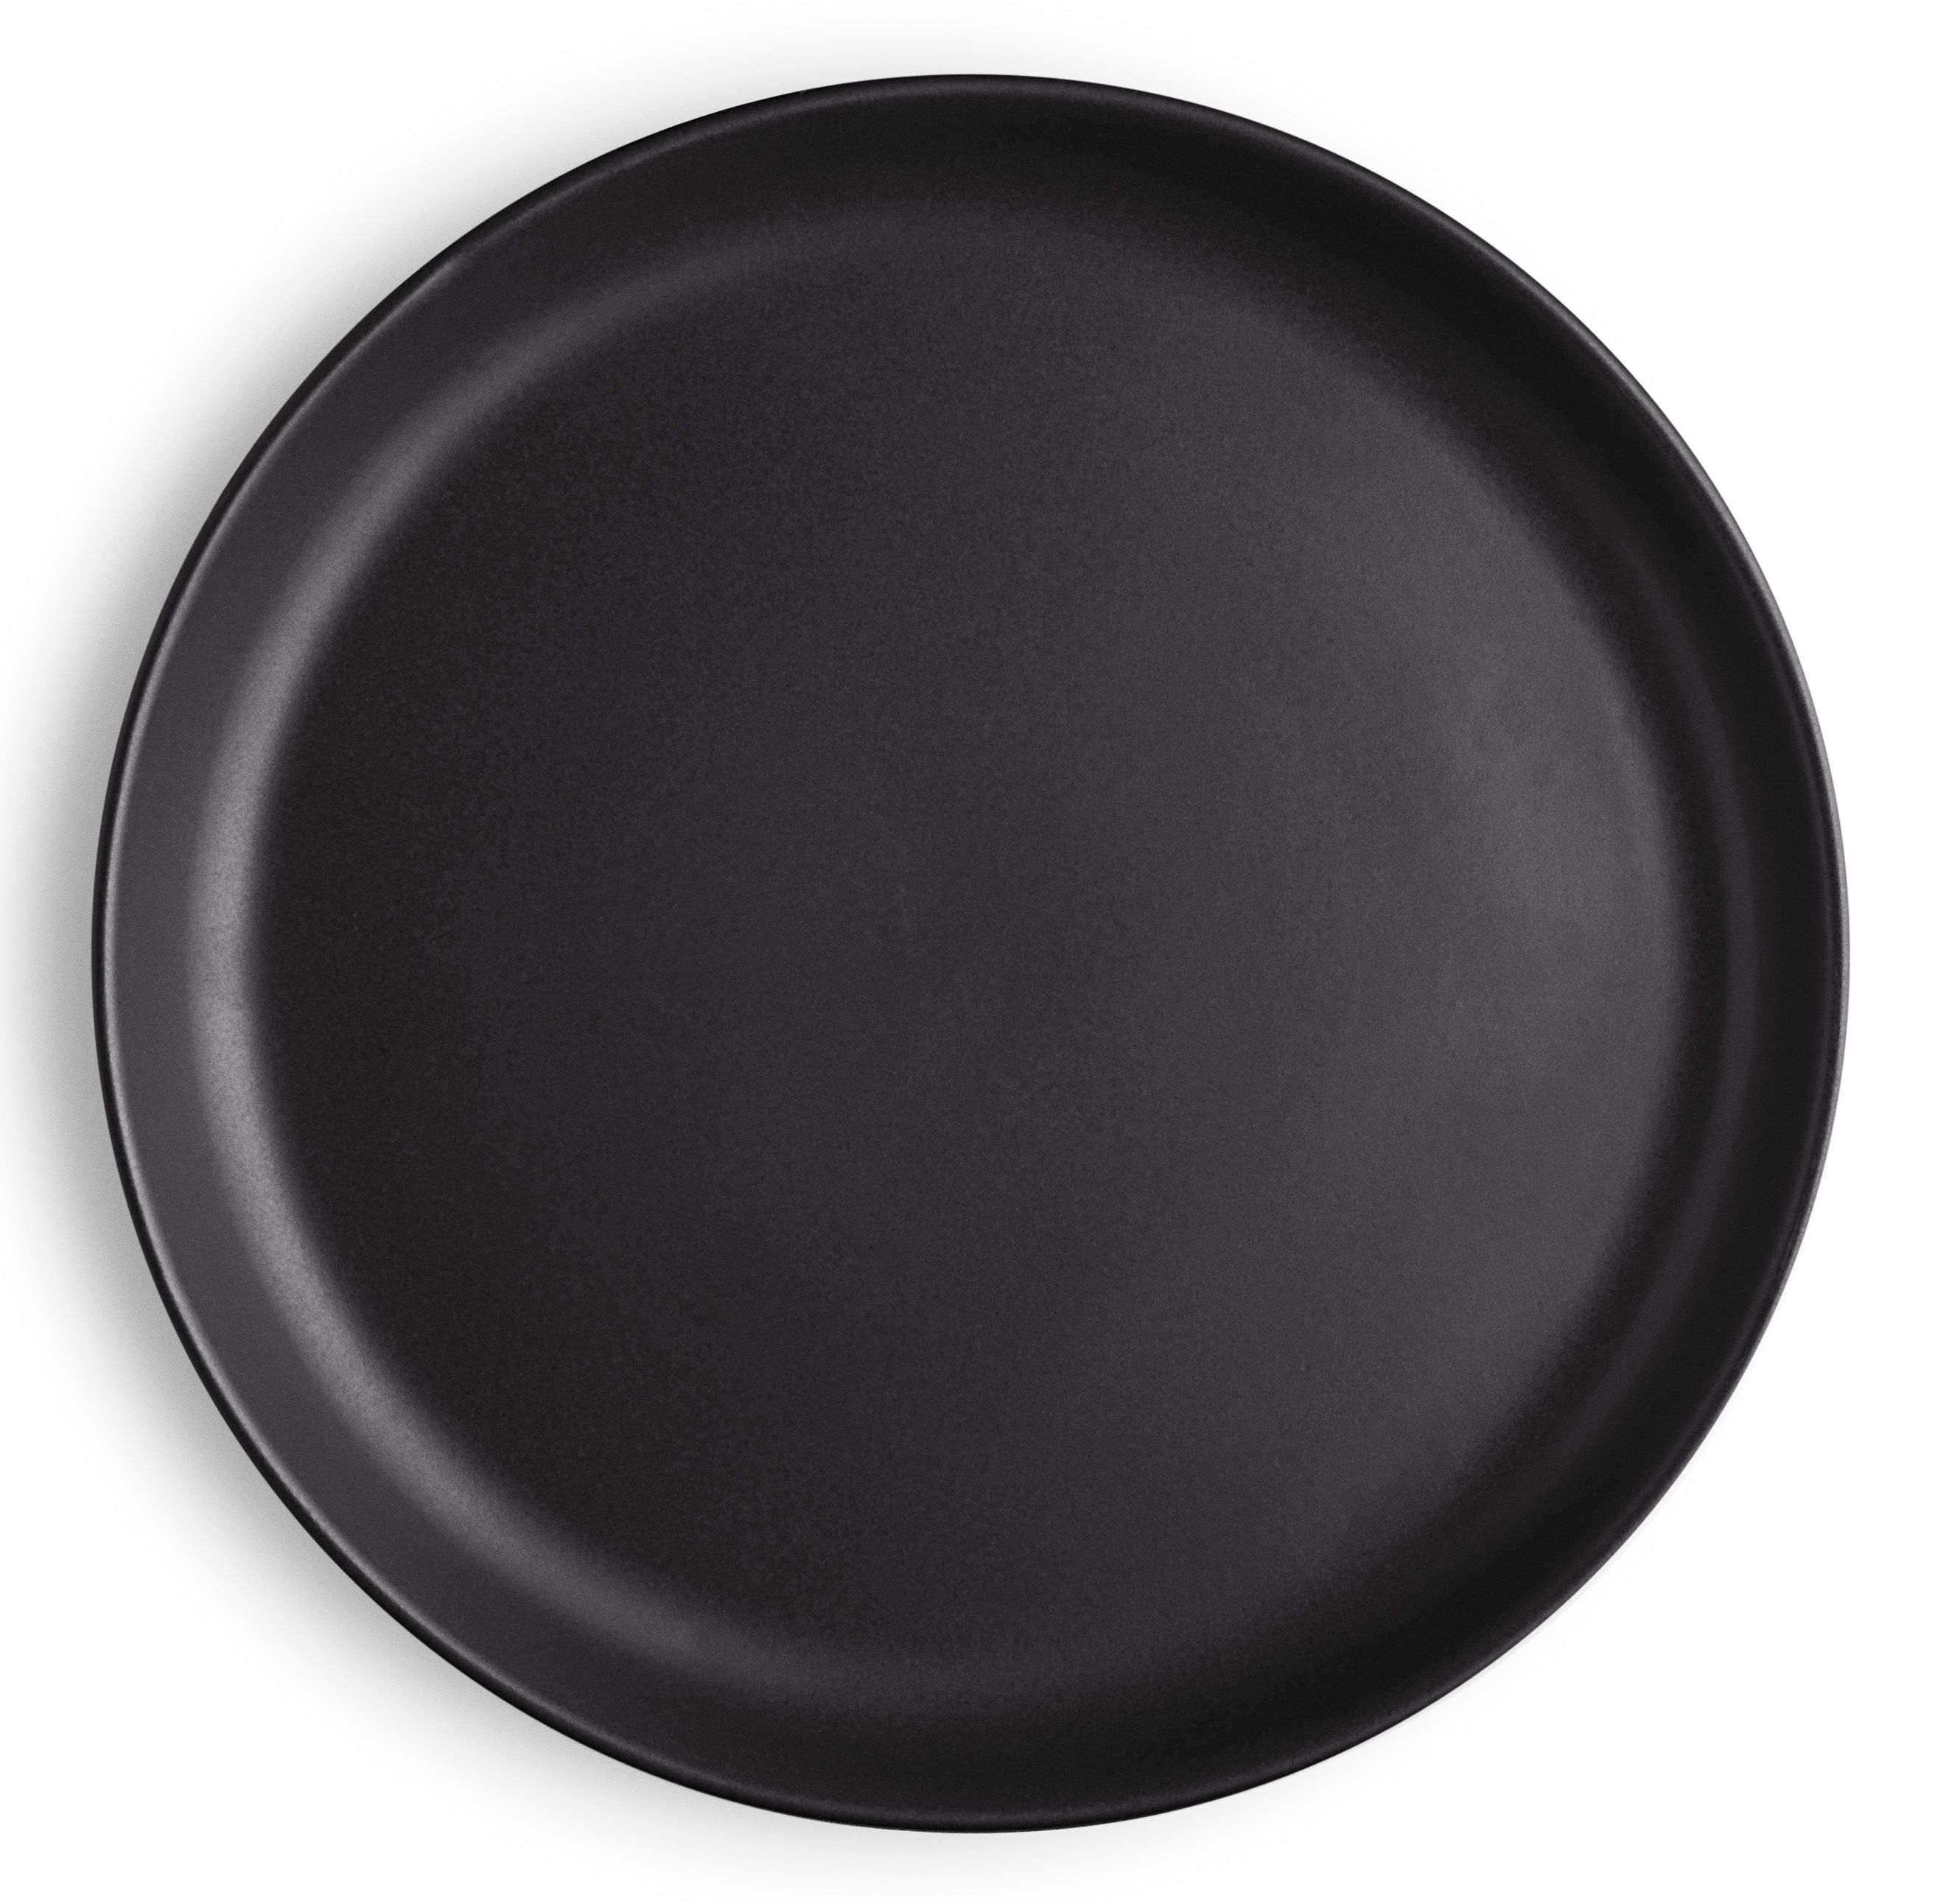 nordic kitchen 22 cm steinzeug eva solo flacher teller. Black Bedroom Furniture Sets. Home Design Ideas